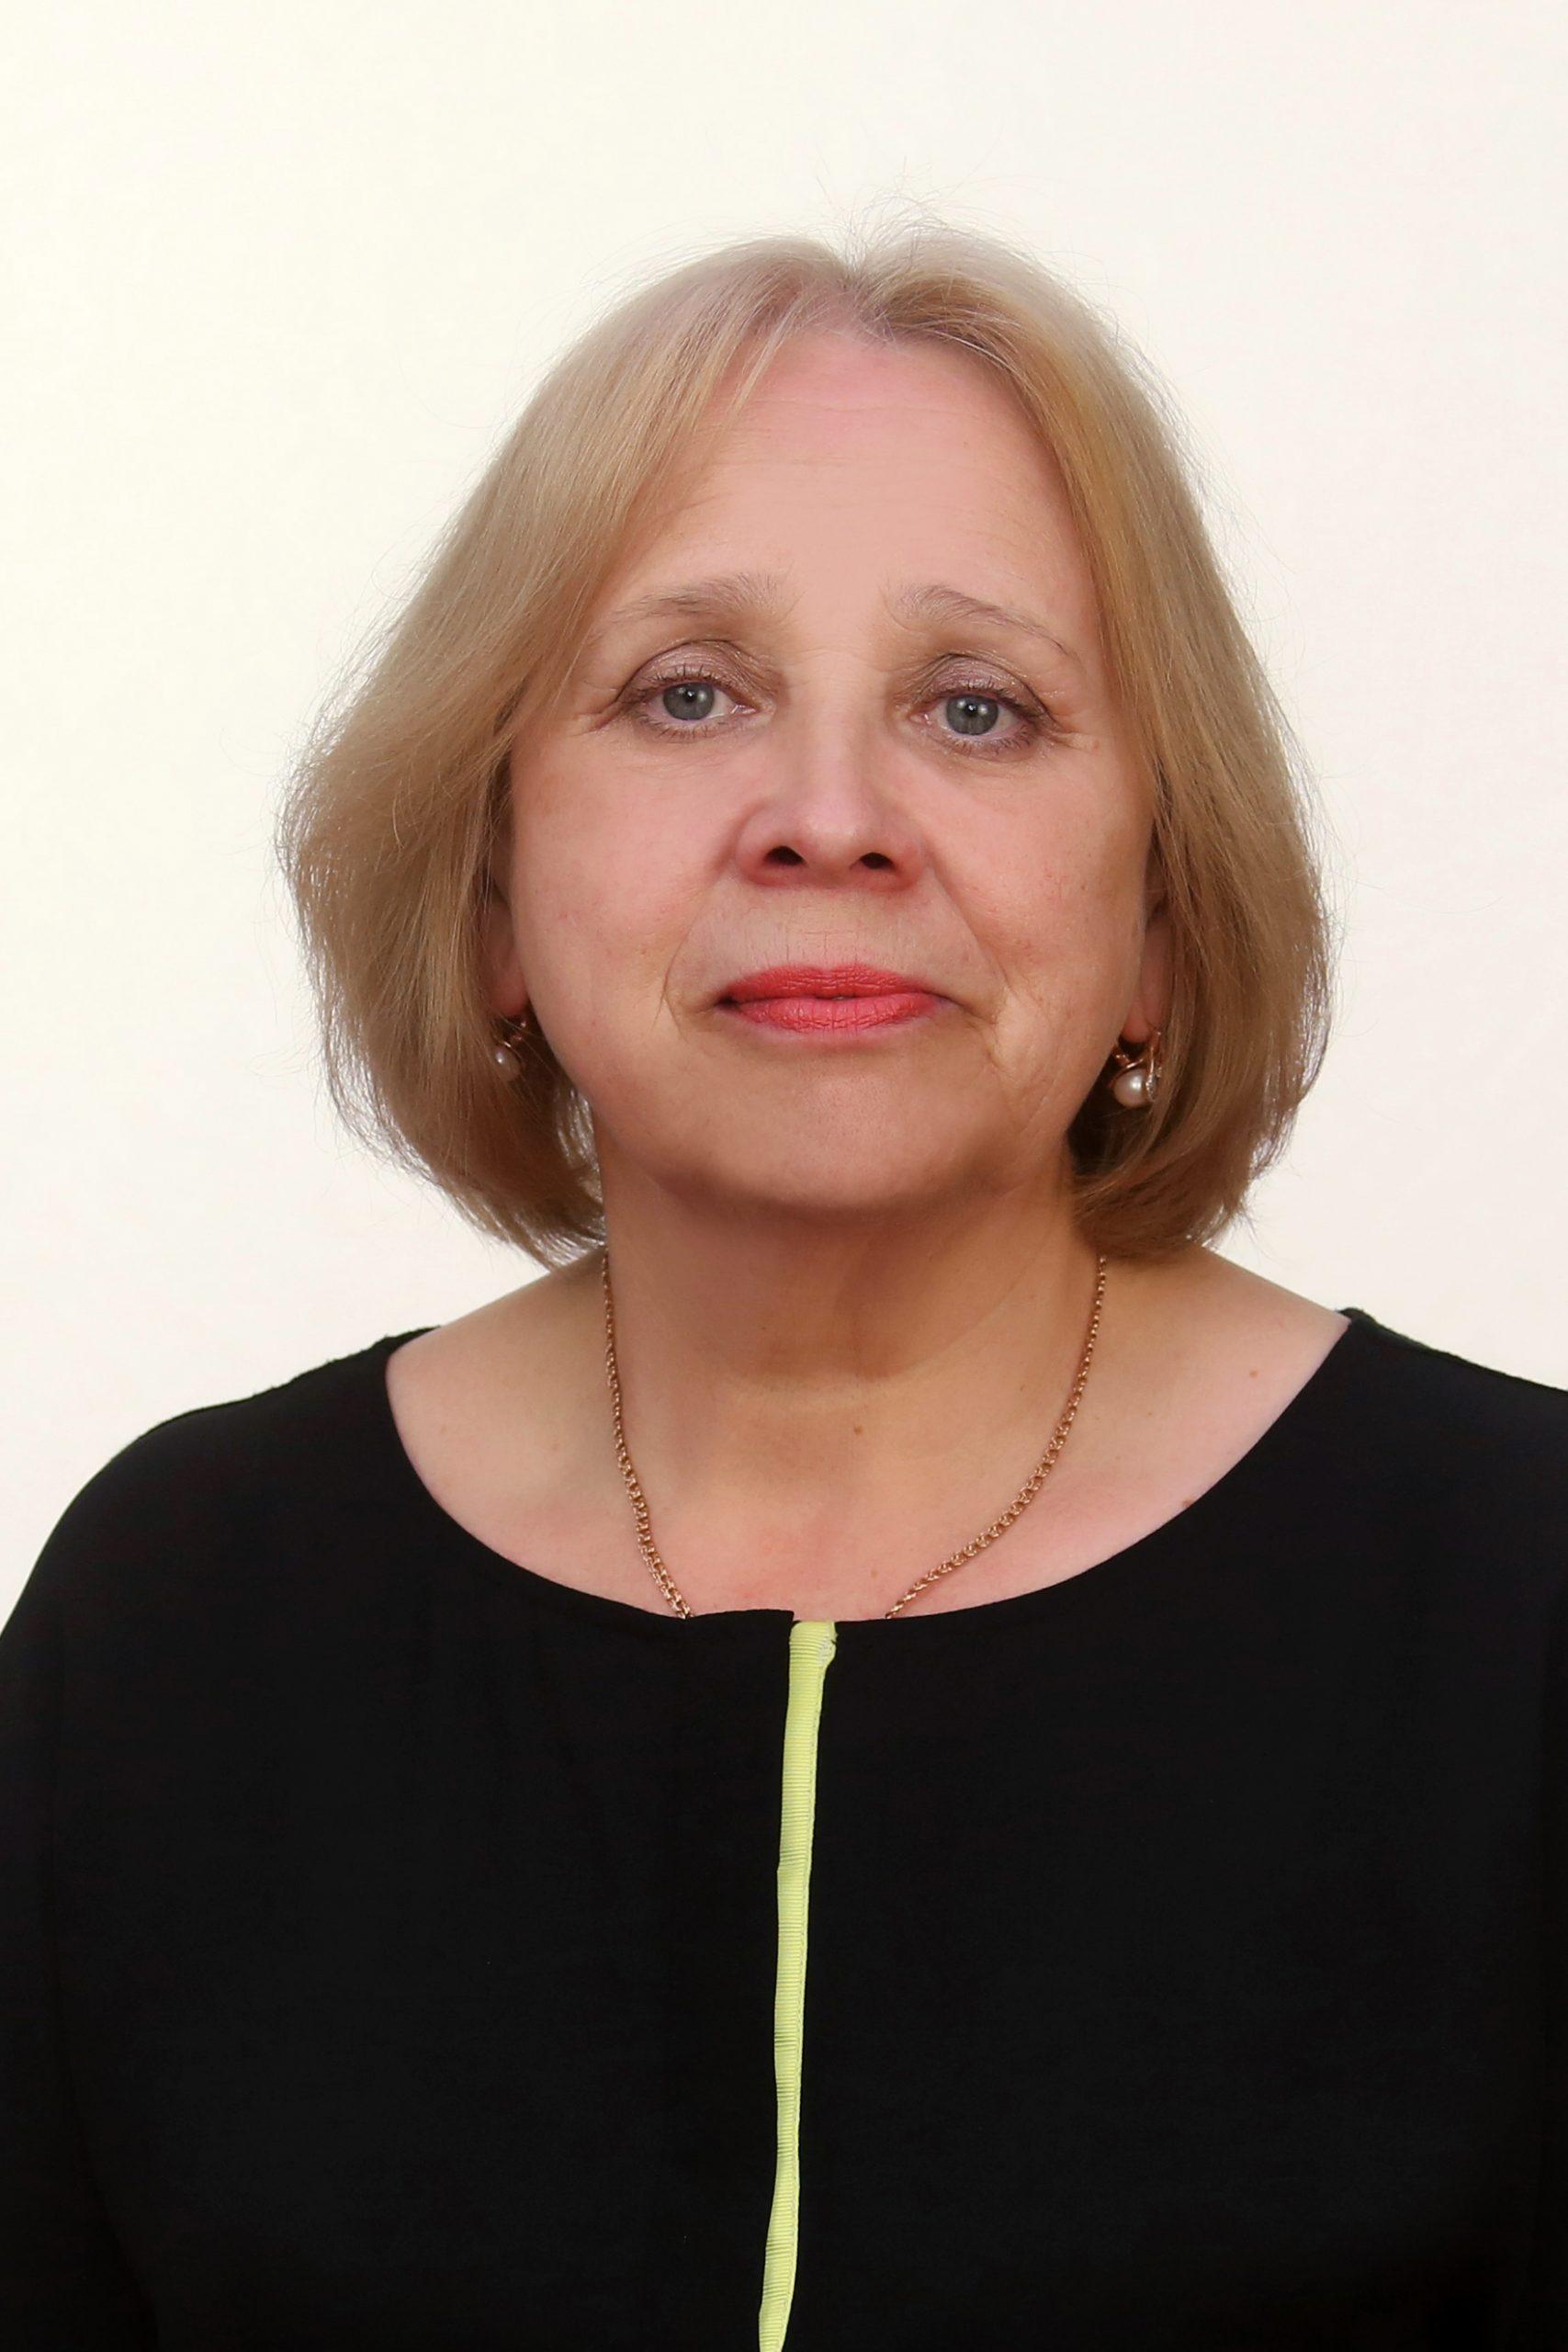 Marija Čirica